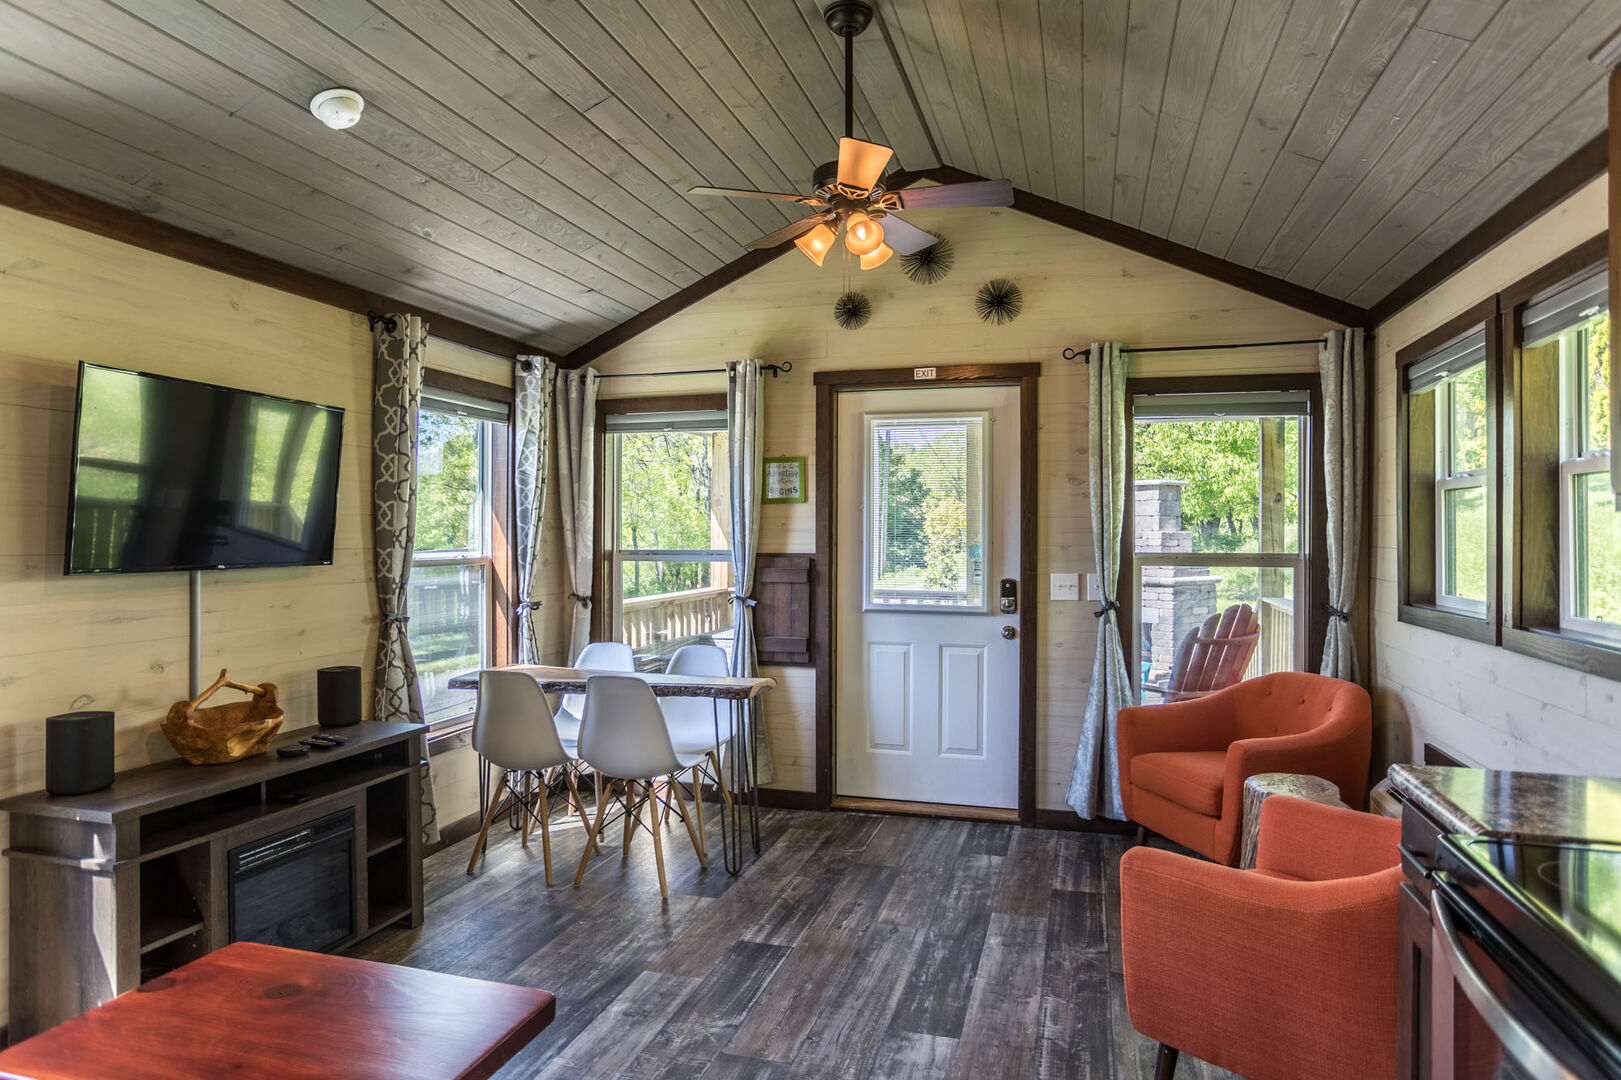 Blue Ridge Mountain Rentals: Tiny House Big Adventures in